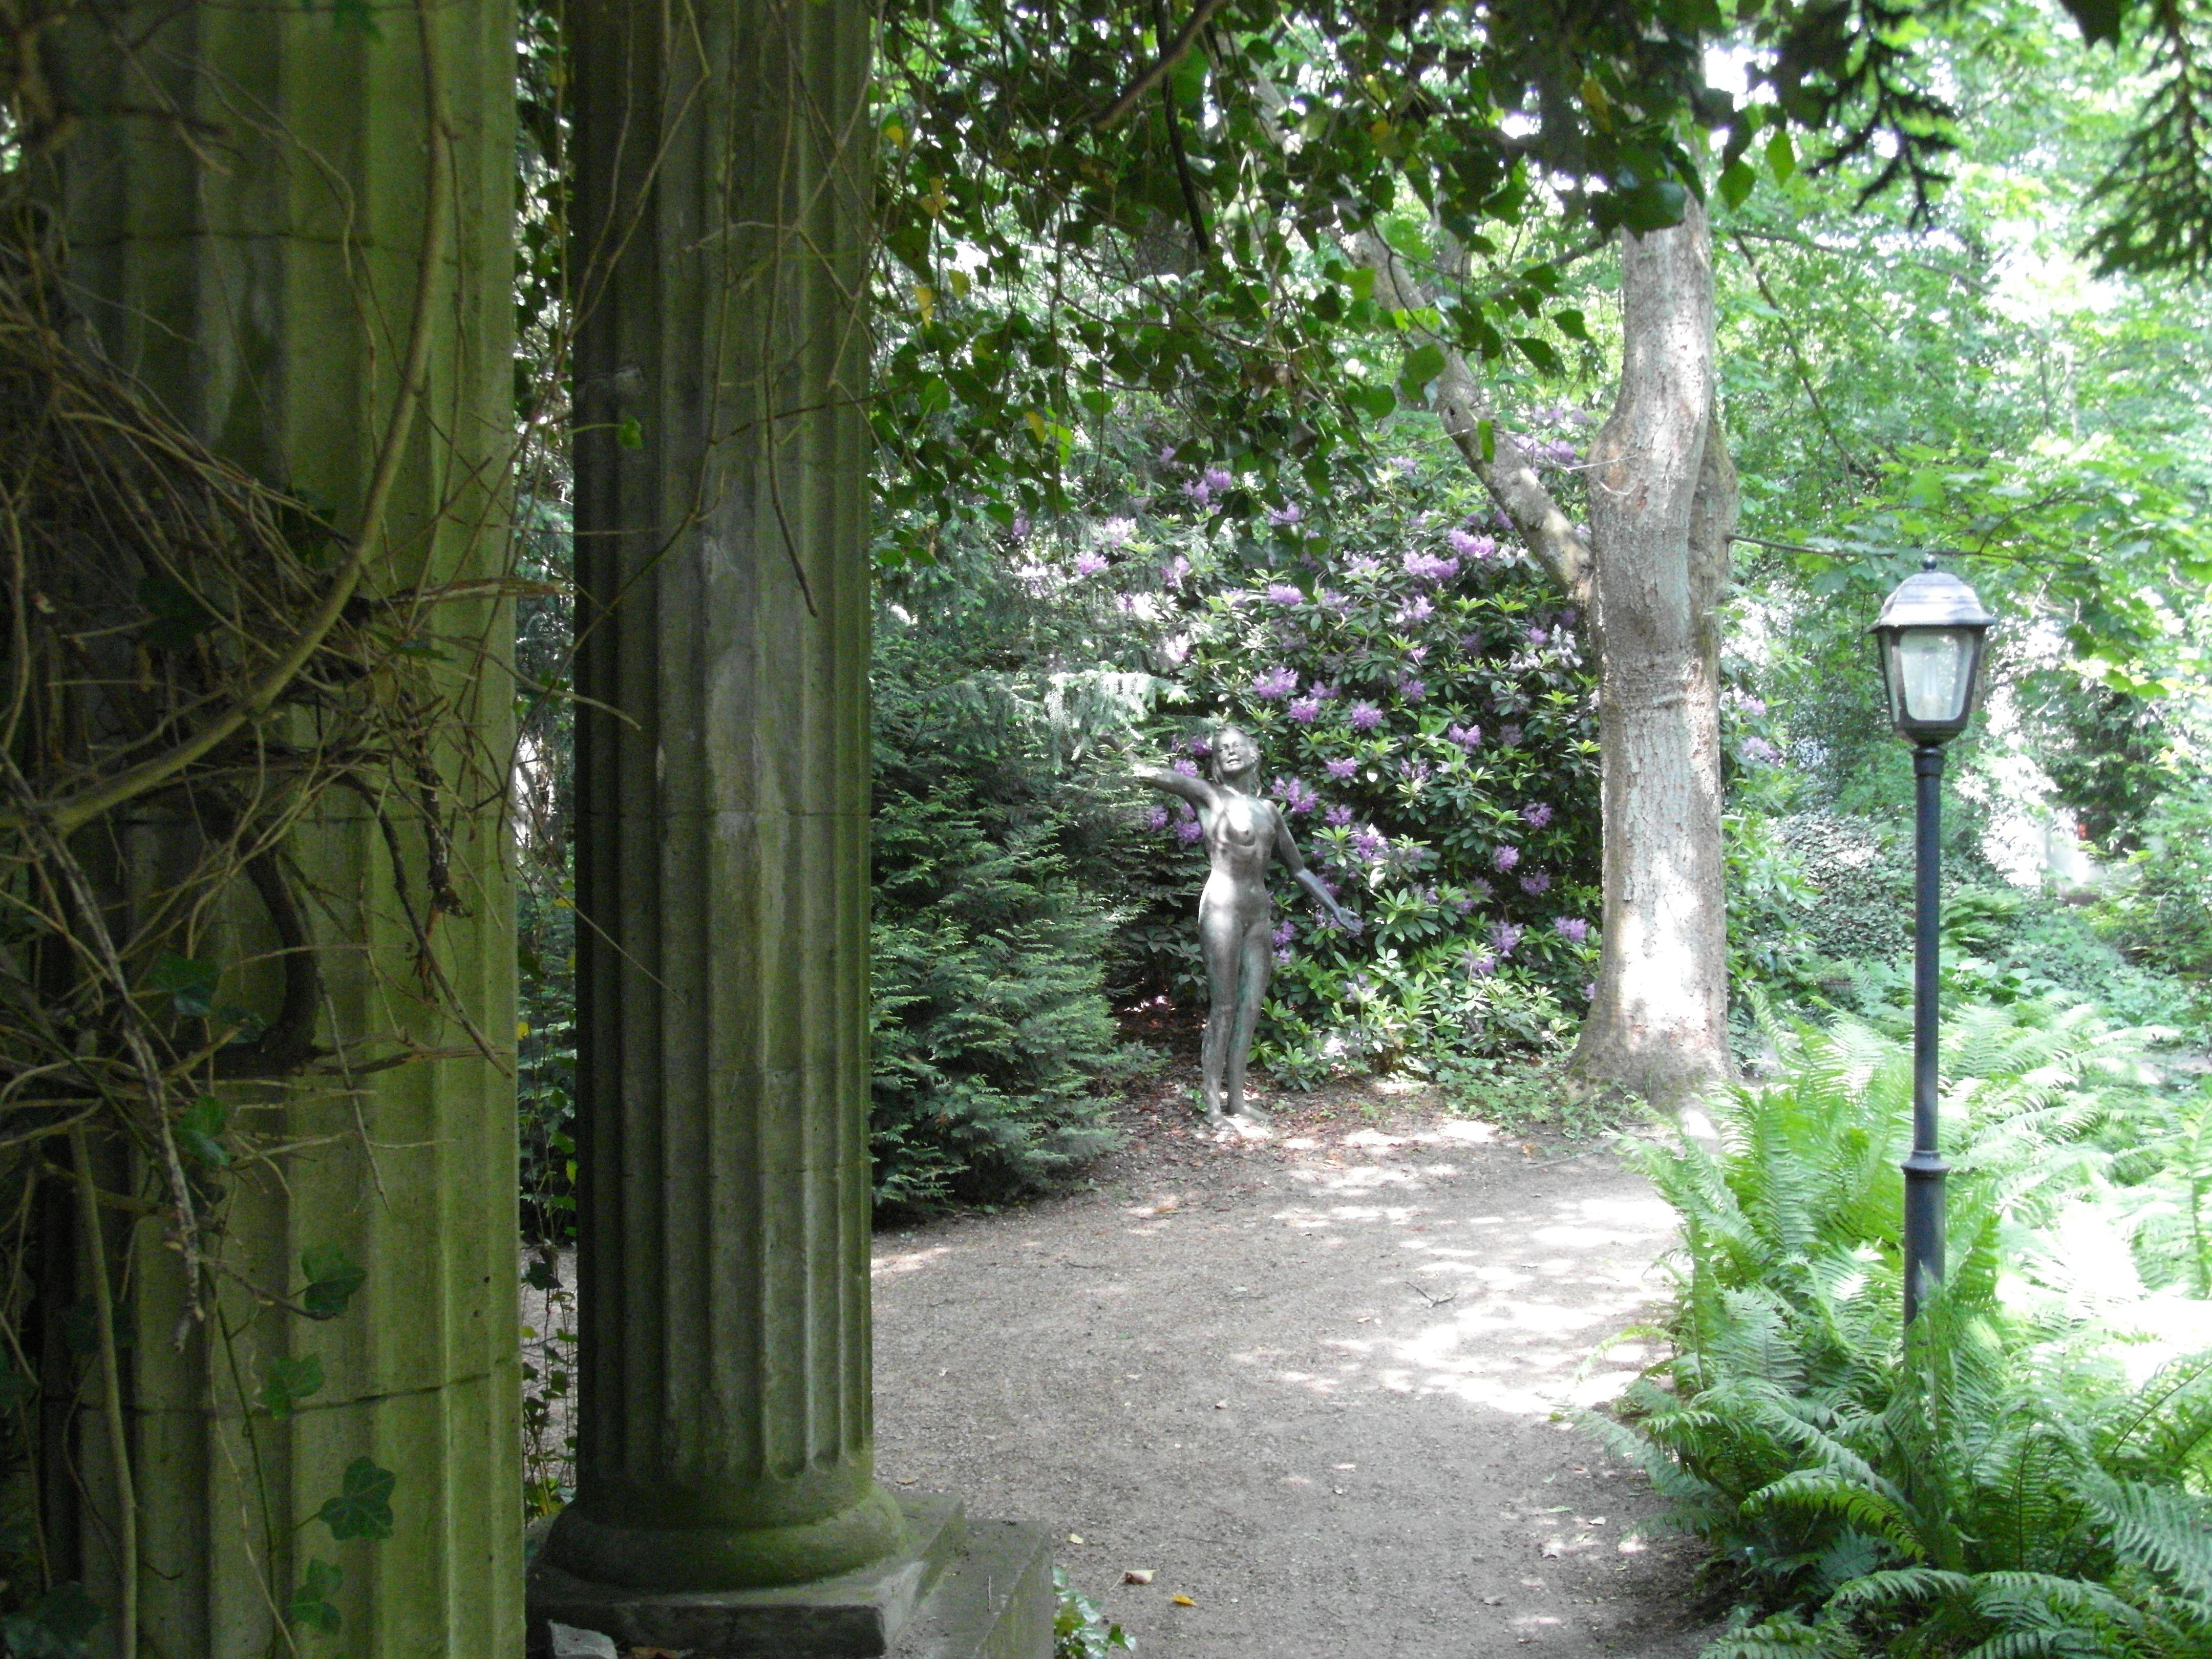 Thieles  Garten ... Säulen ... Modell ... / Copyright Horst H. Barsuhn; Bremerhaven (Germany)